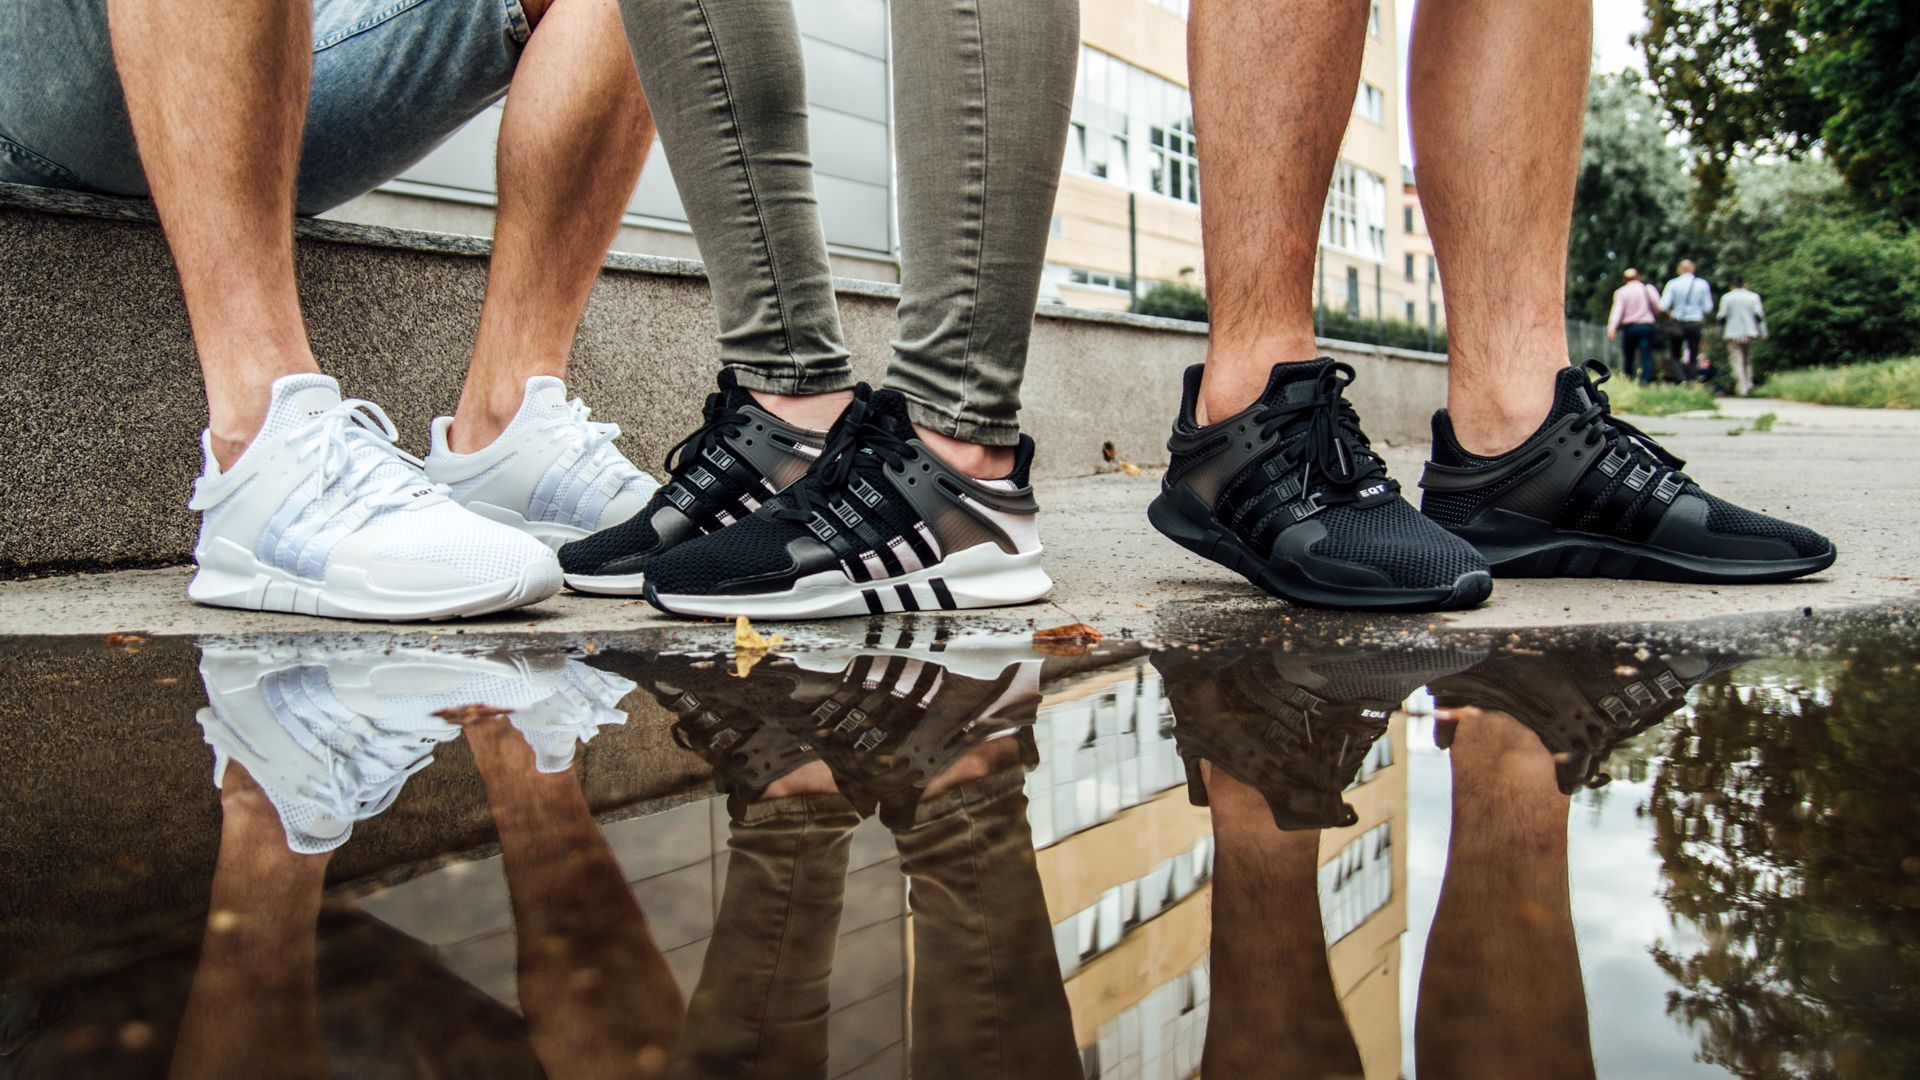 buy popular 37902 d6d22 ... new arrivals 050a7 bed55 Pin by Footshop on Footshop Mens Sneakers  Pinterest Eqt . new arrivals fa6ab 4afce adidas eqt support ...